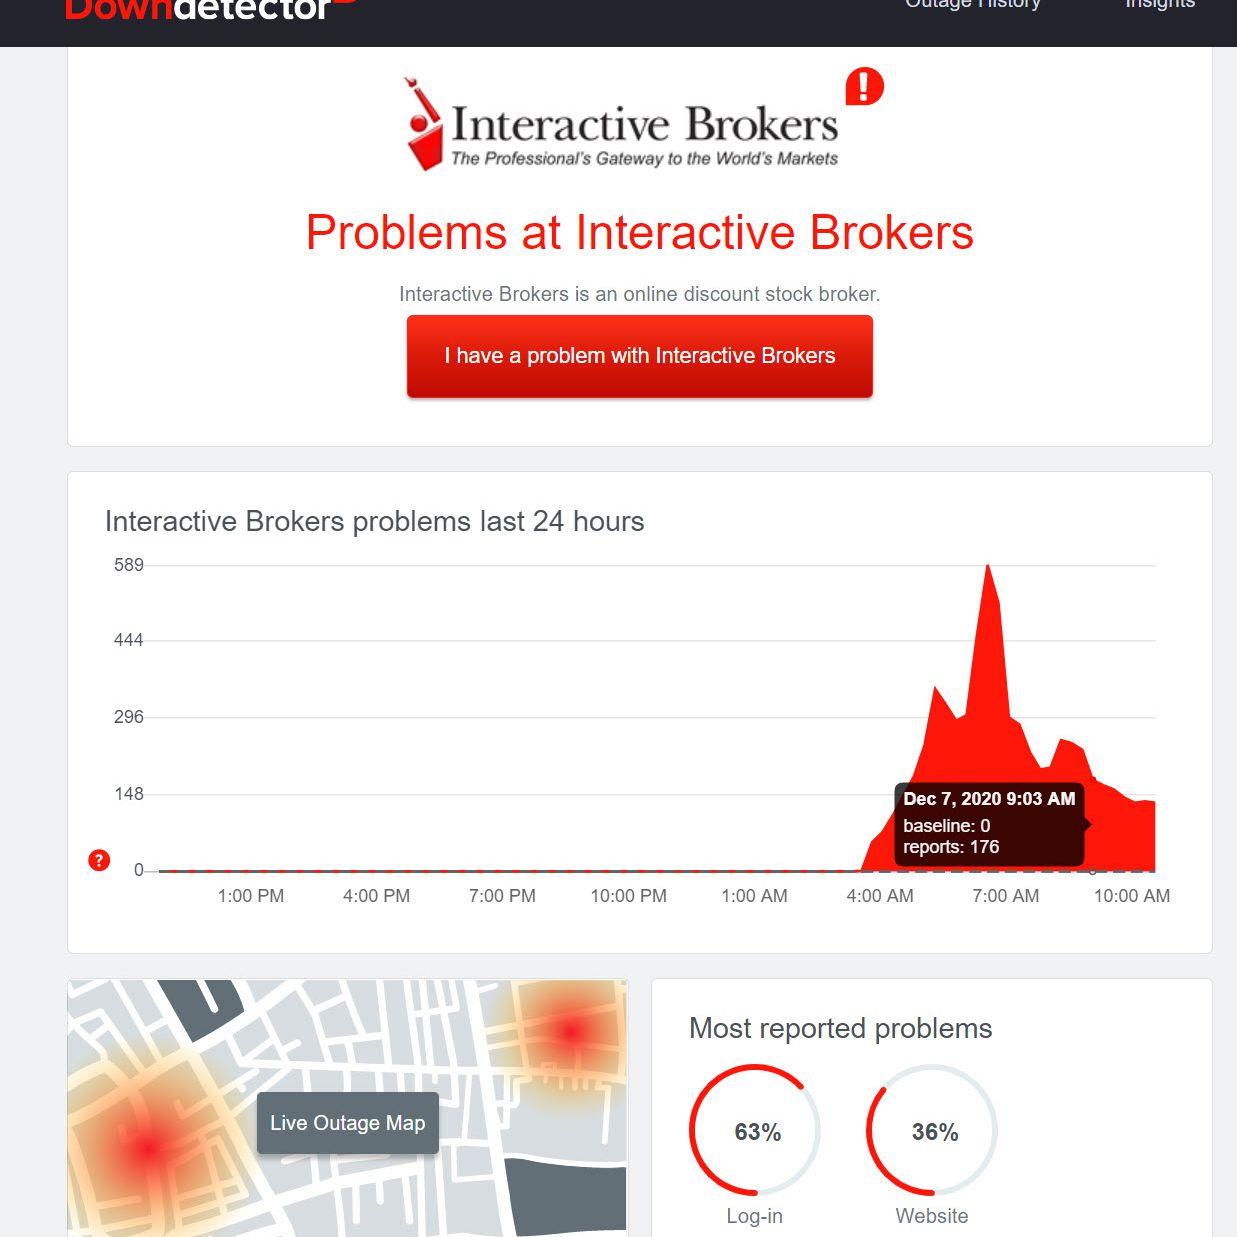 Downdetector IBKR problem reports